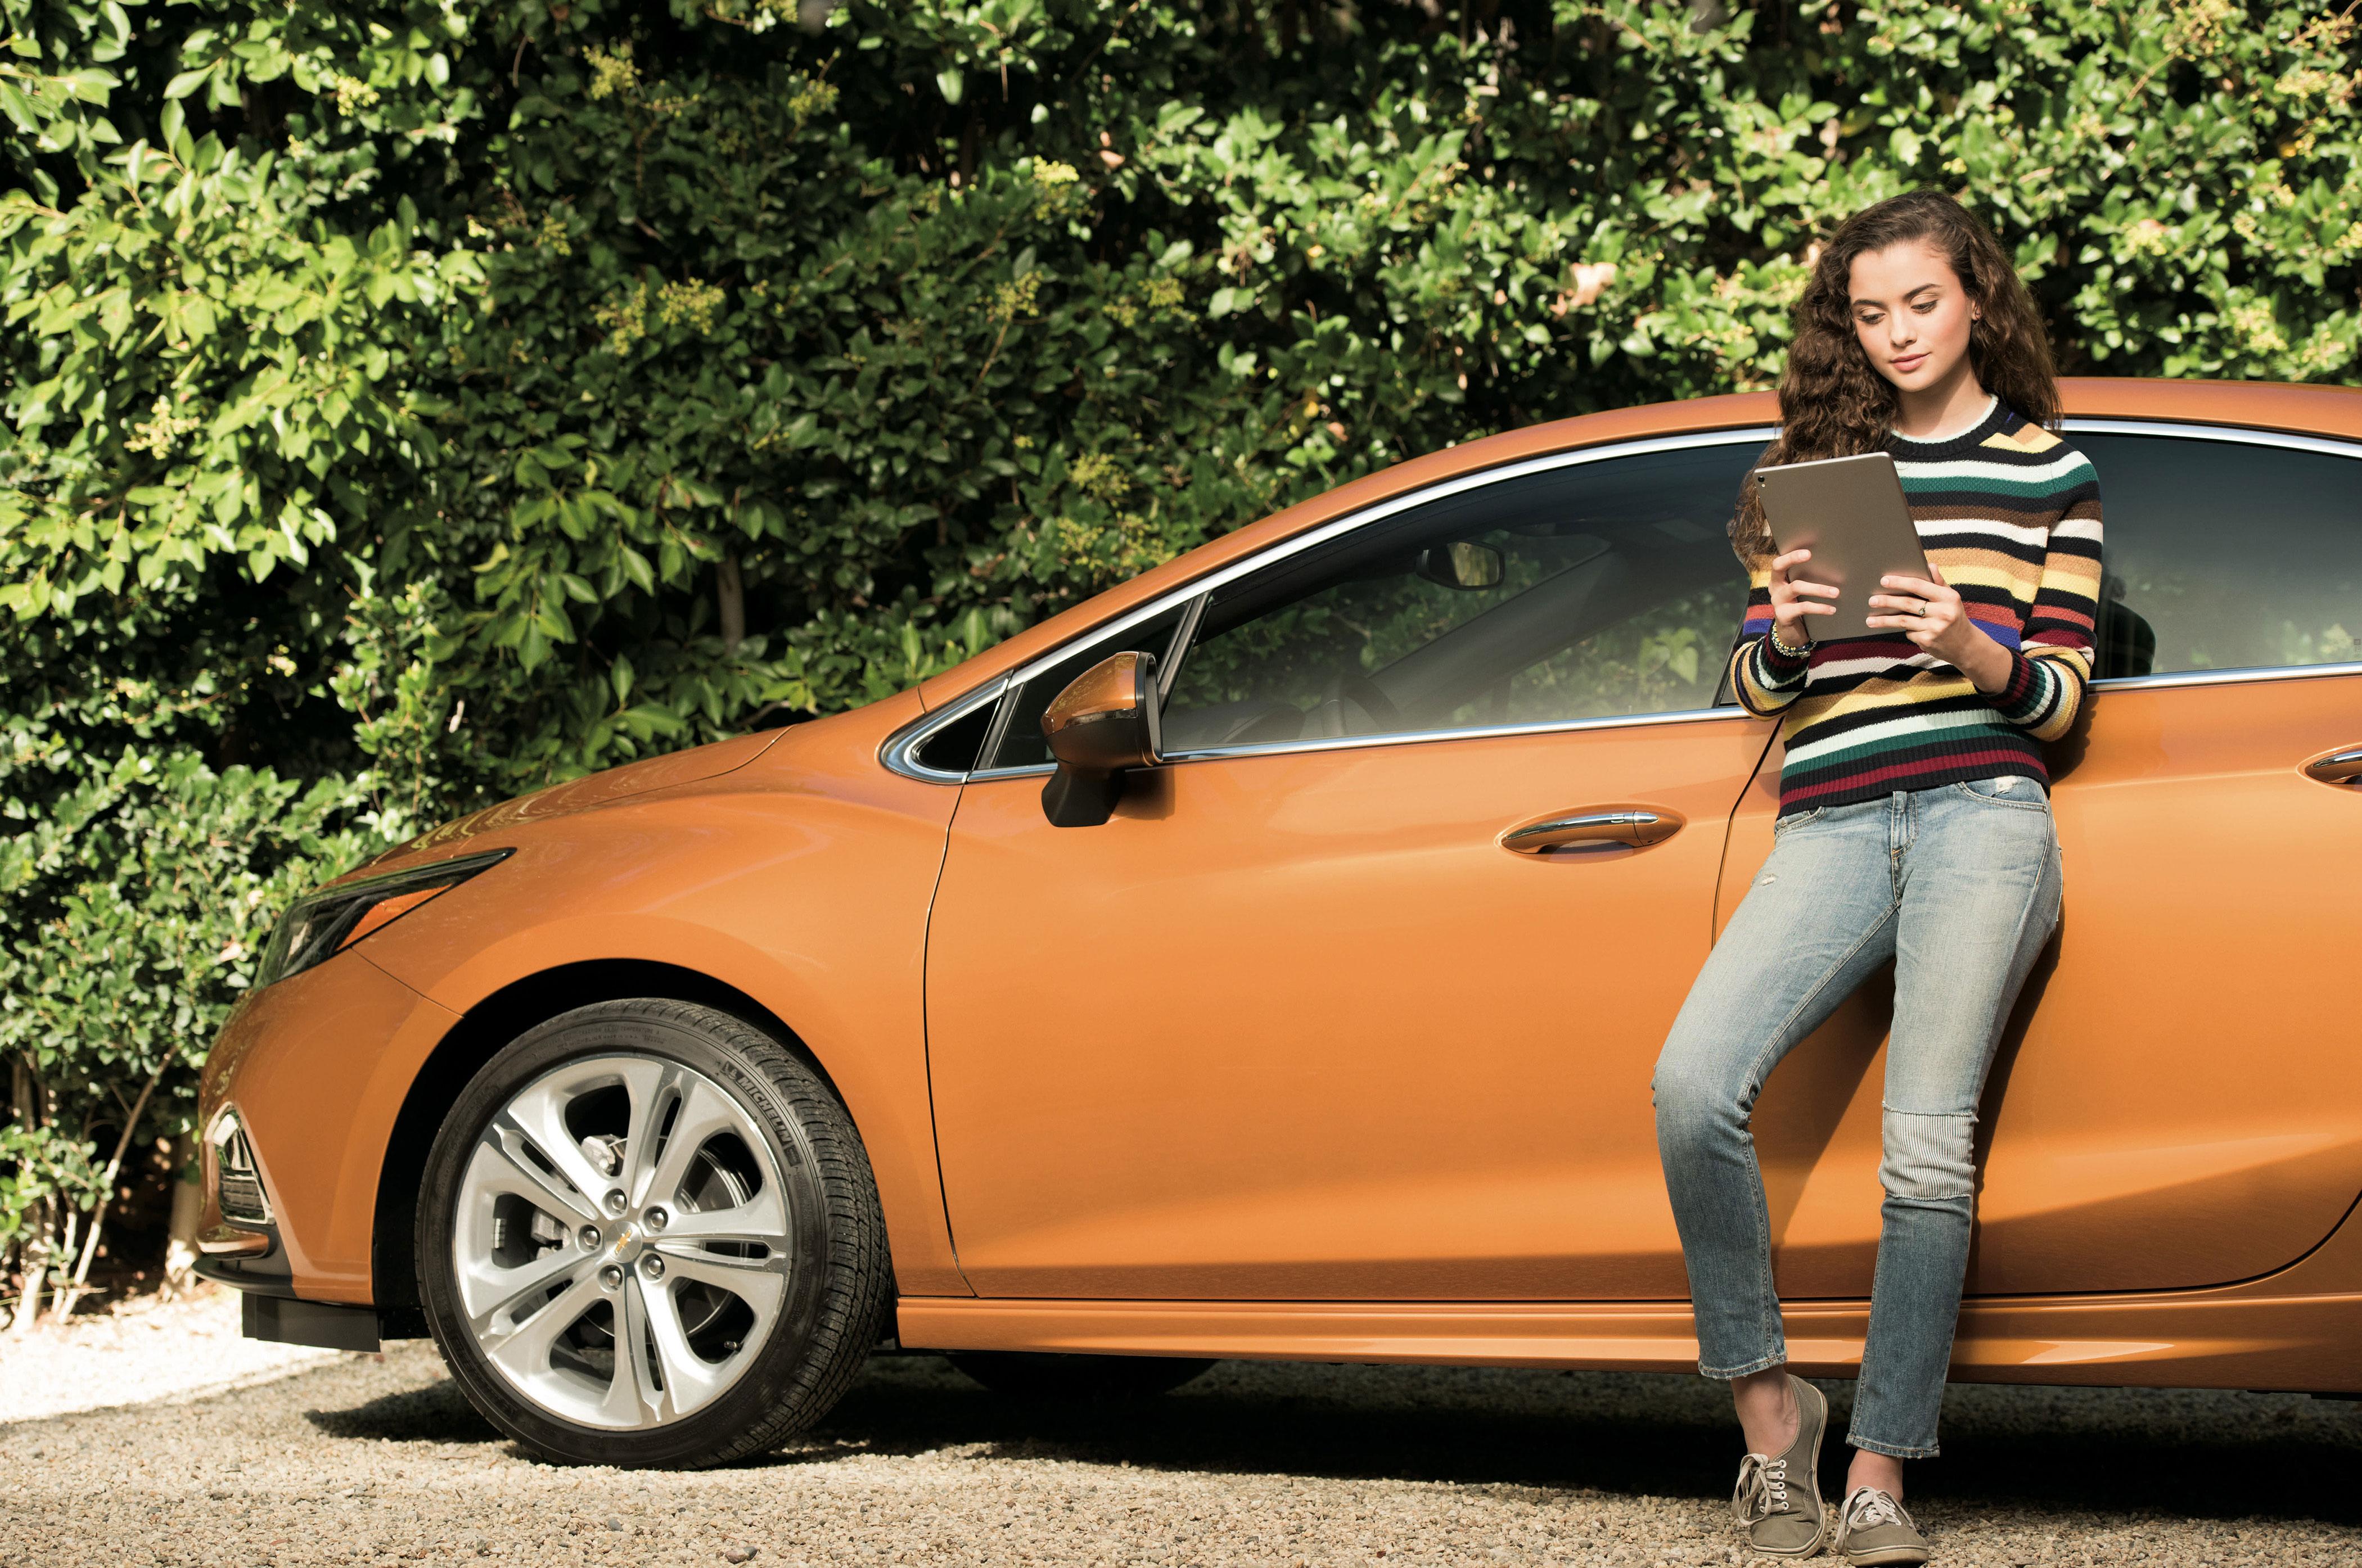 2017 Chevrolet Cruze in vehicle OnStar 4GLTE Wi Fi